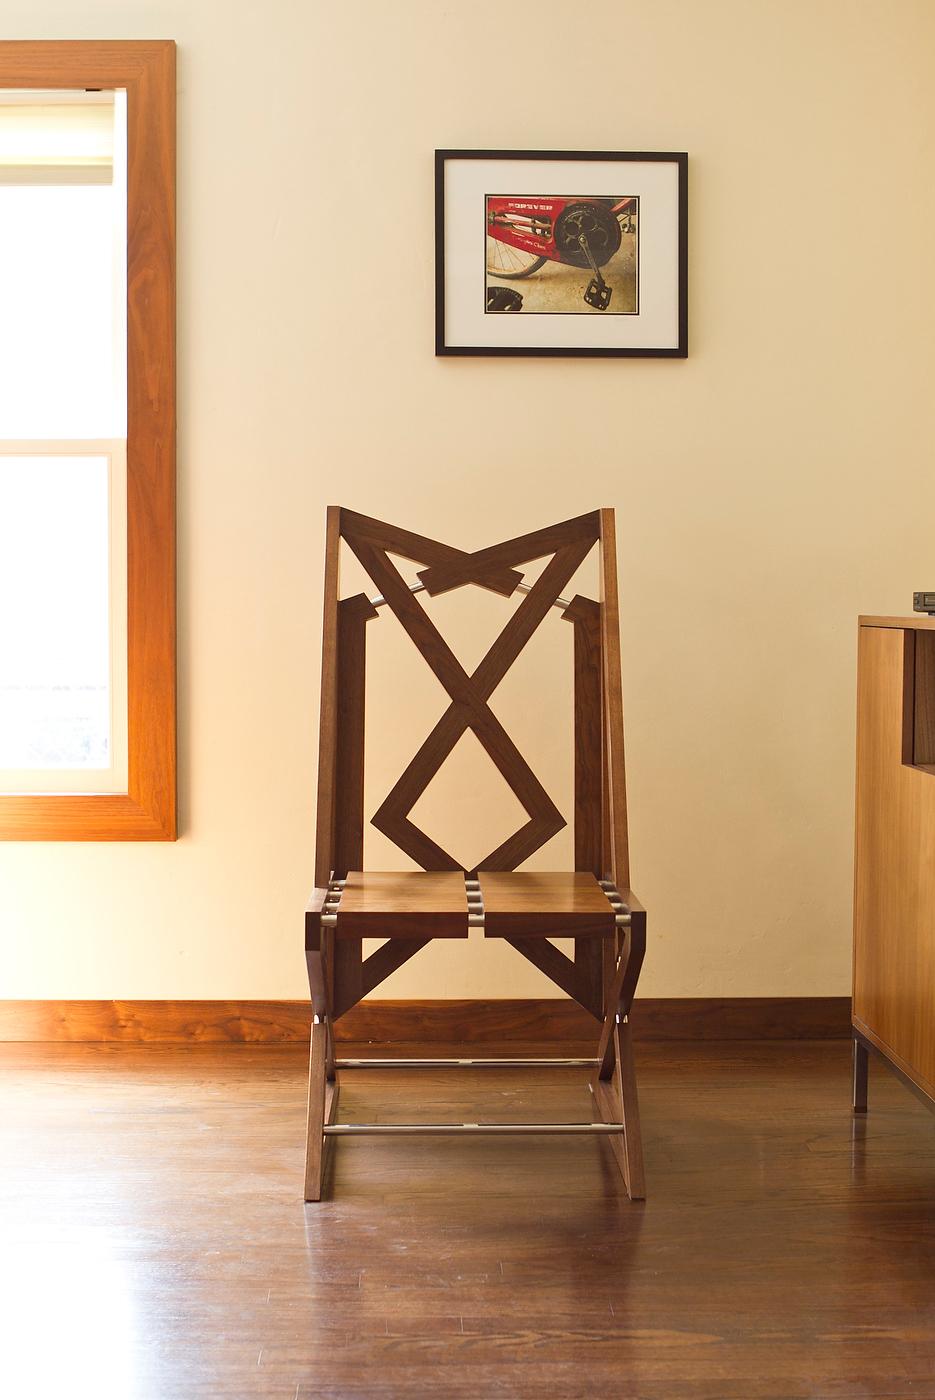 furniture-chair-thing-03.jpg